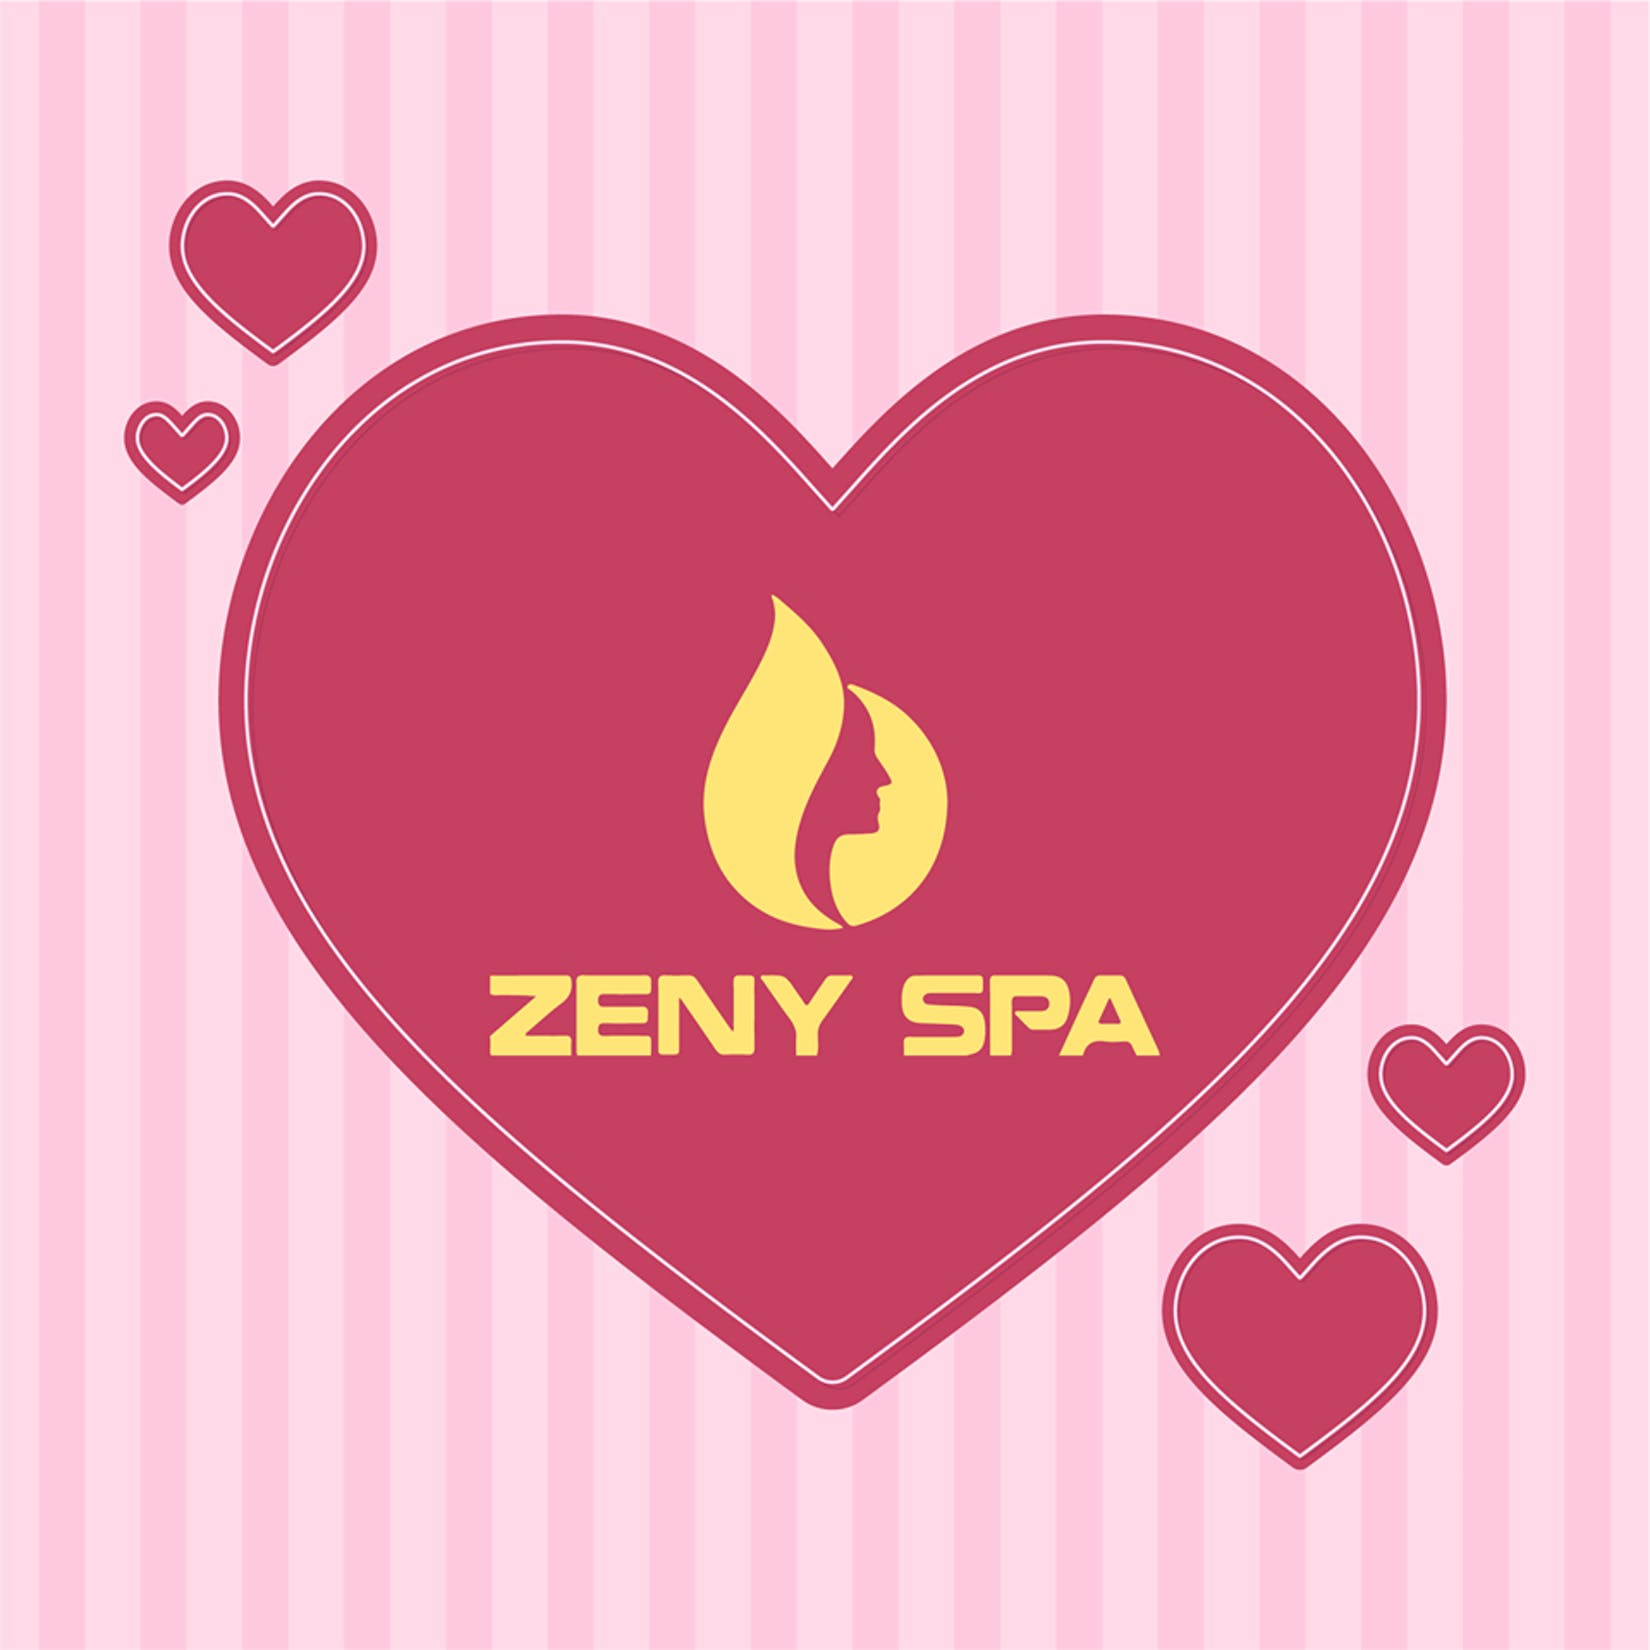 ZENY SPA Beauty Center - Yangon | Beauty